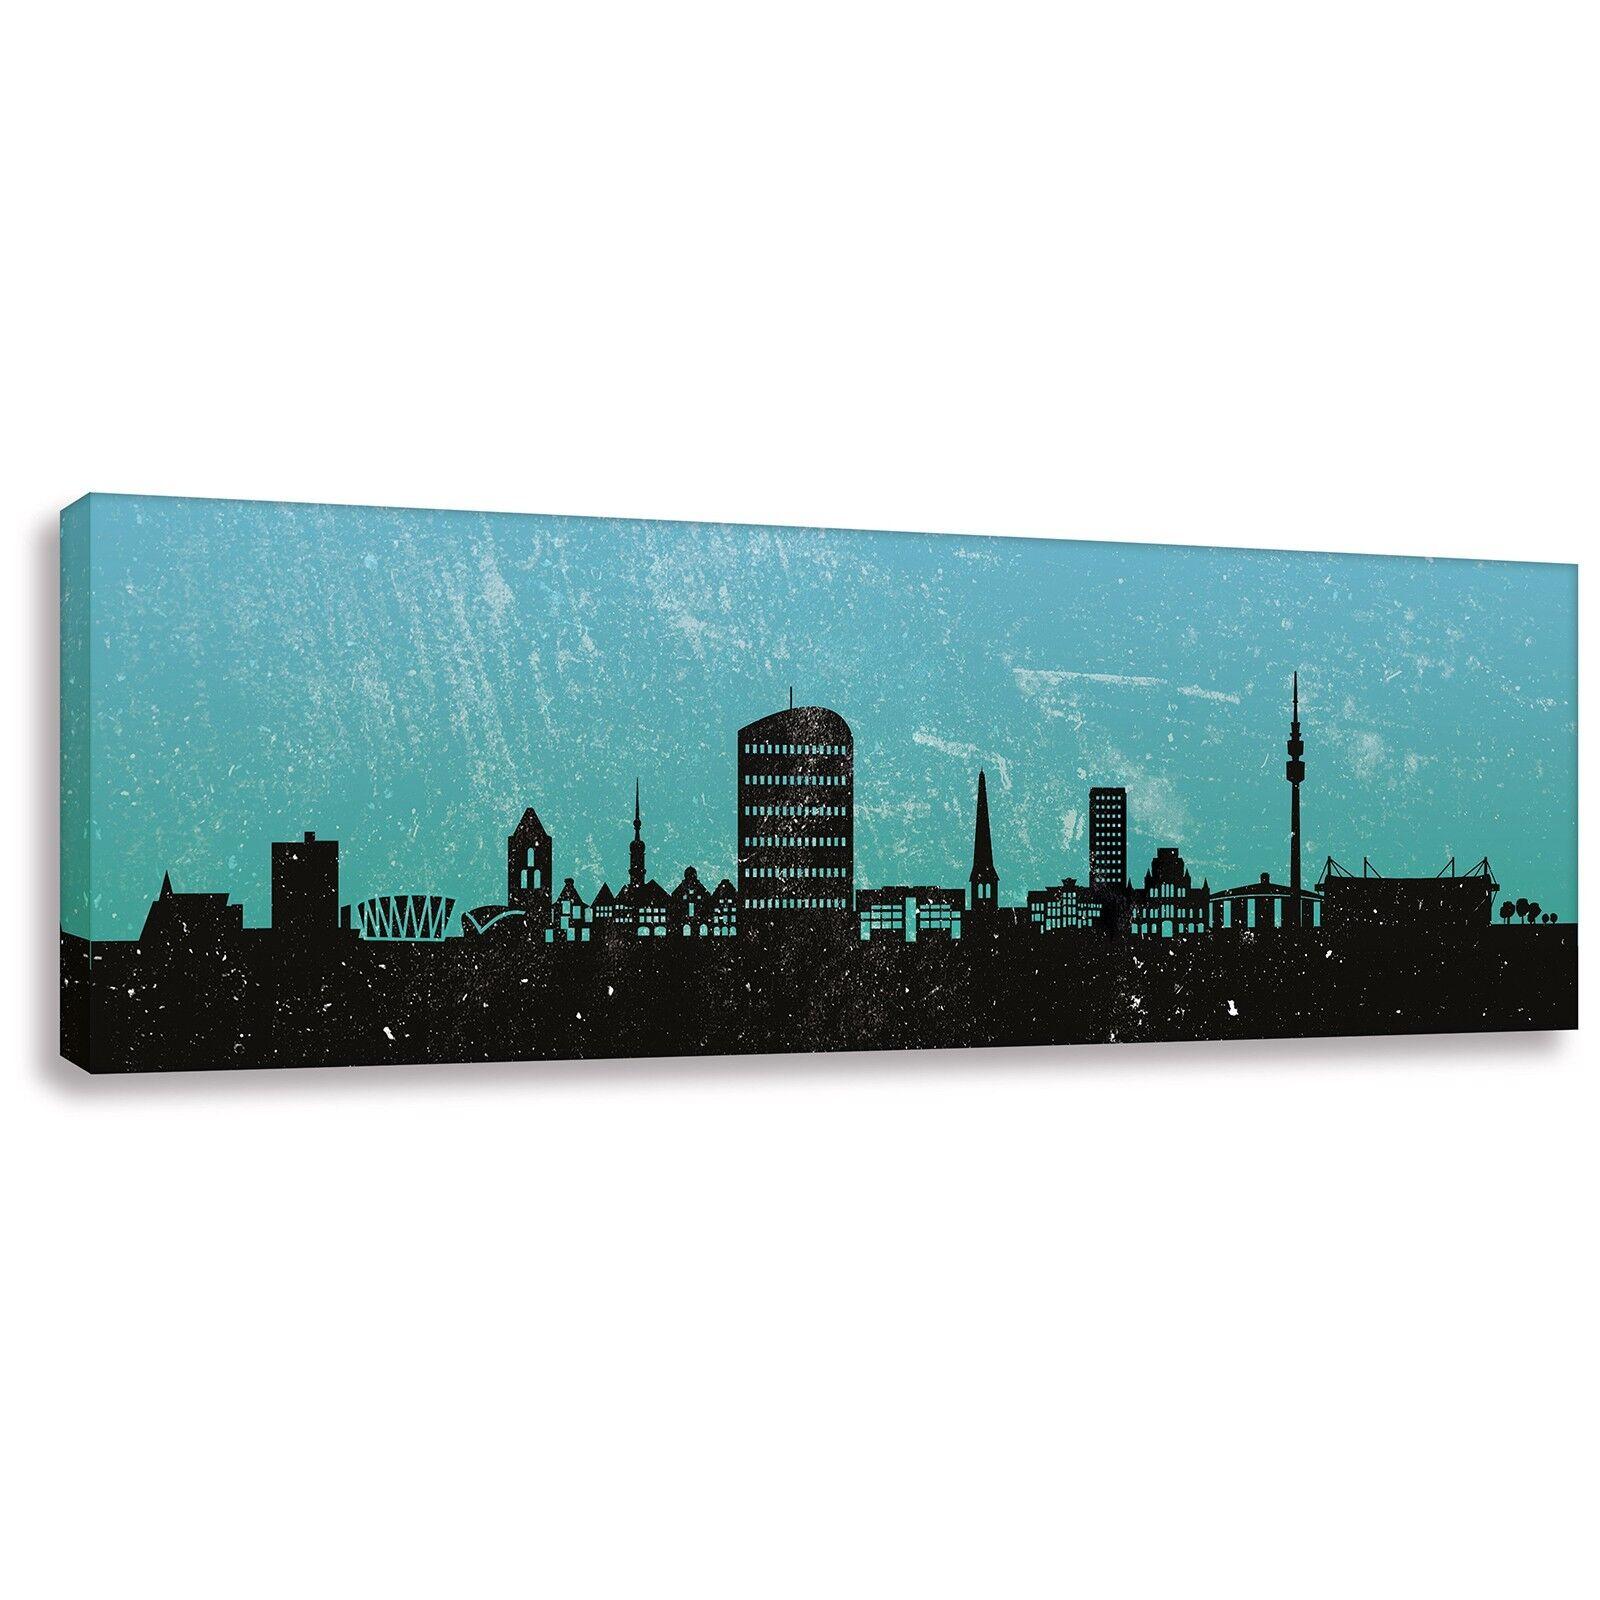 Panorama Bild Kunstdruck auf Leinwand Skyline Dortmund Türkis div. Größen